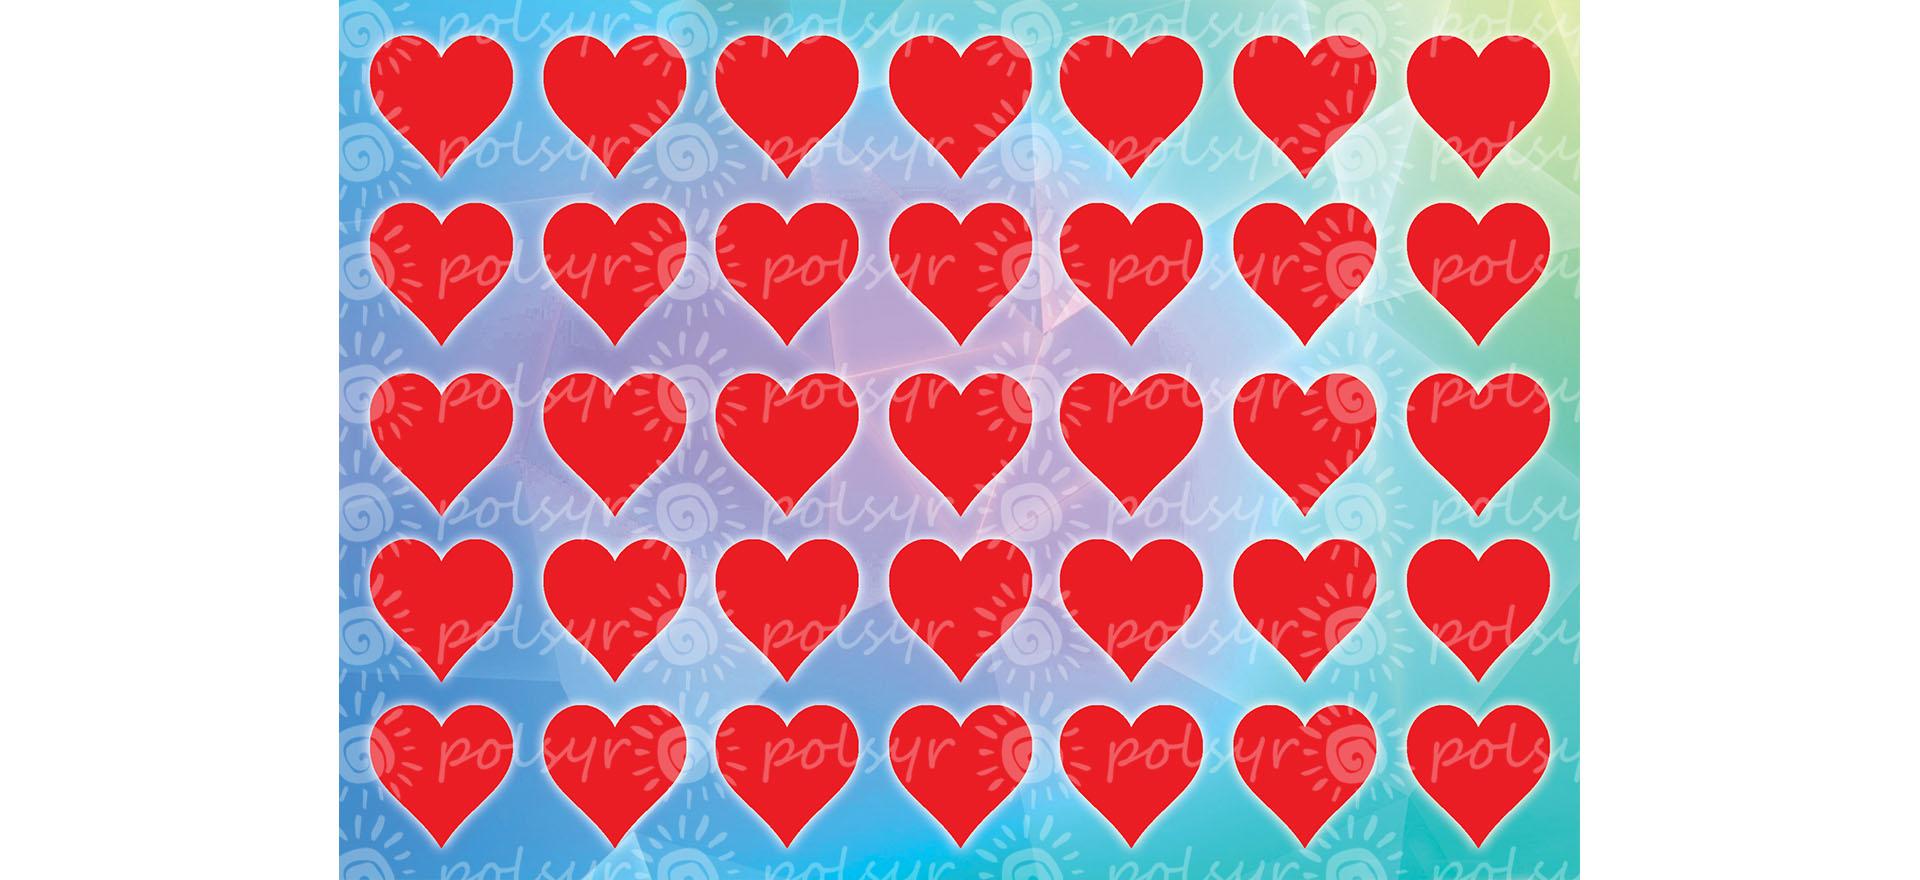 naklejki-serca-duze-polsyr-2